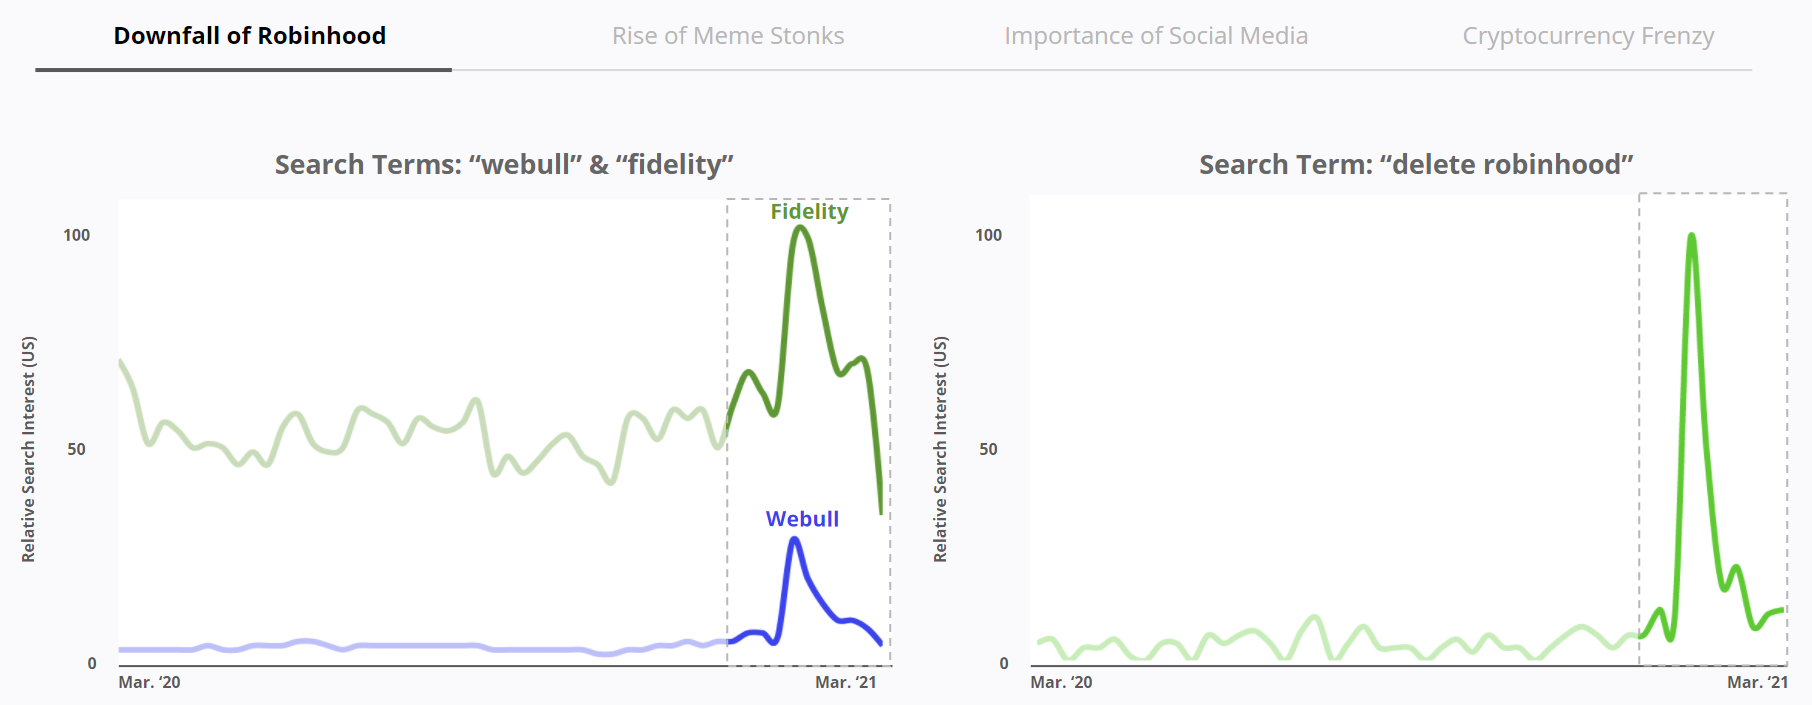 Downfall of Robinhood - Relative Search Interest US